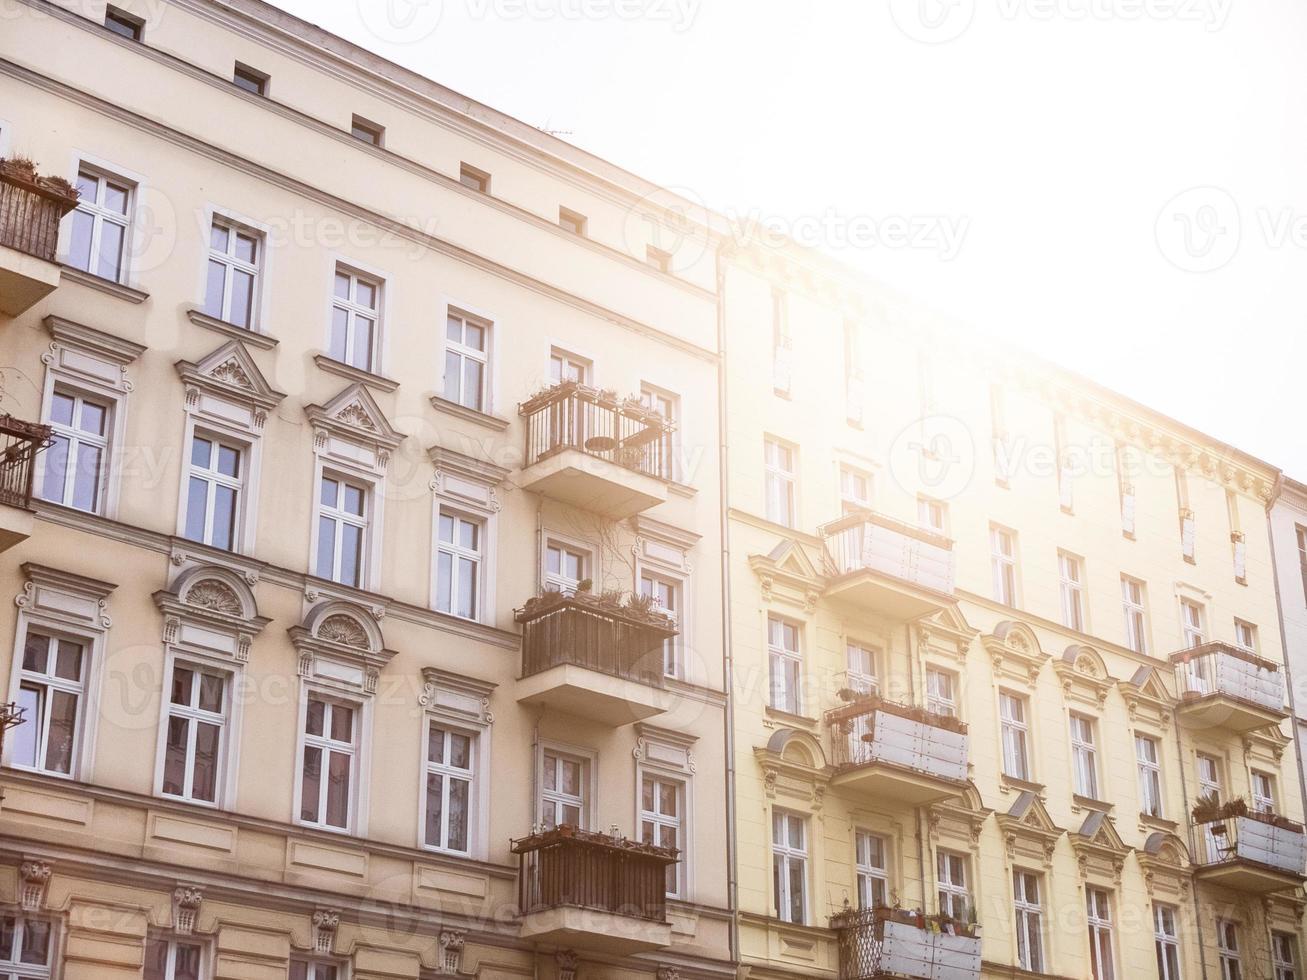 appartements luxueux à prenzlauer berg, berlin photo